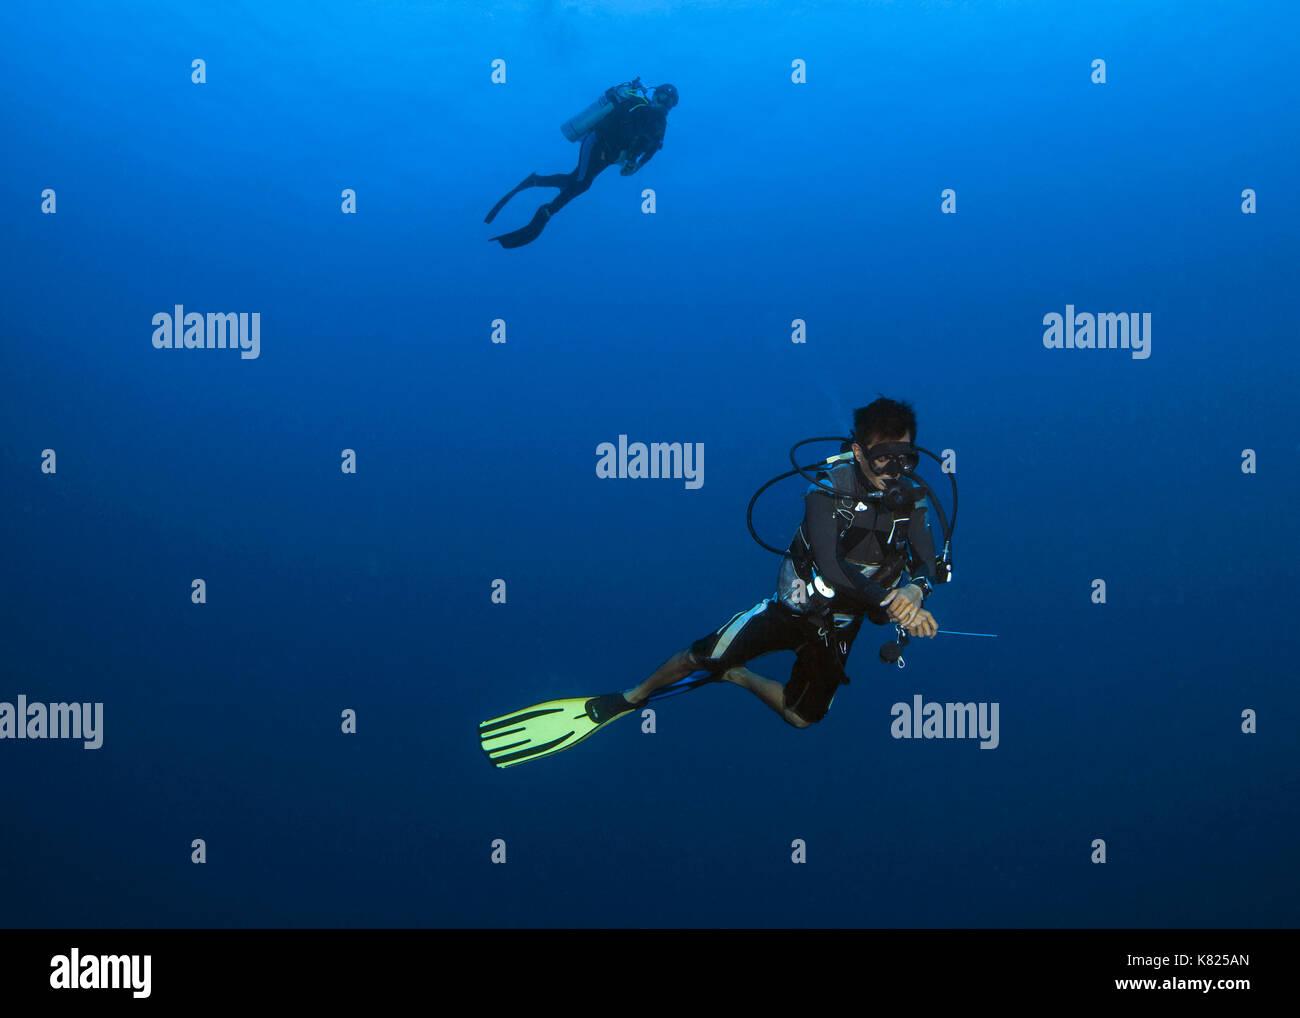 Spratly island stock photos spratly island stock images - Dive deep blue ...